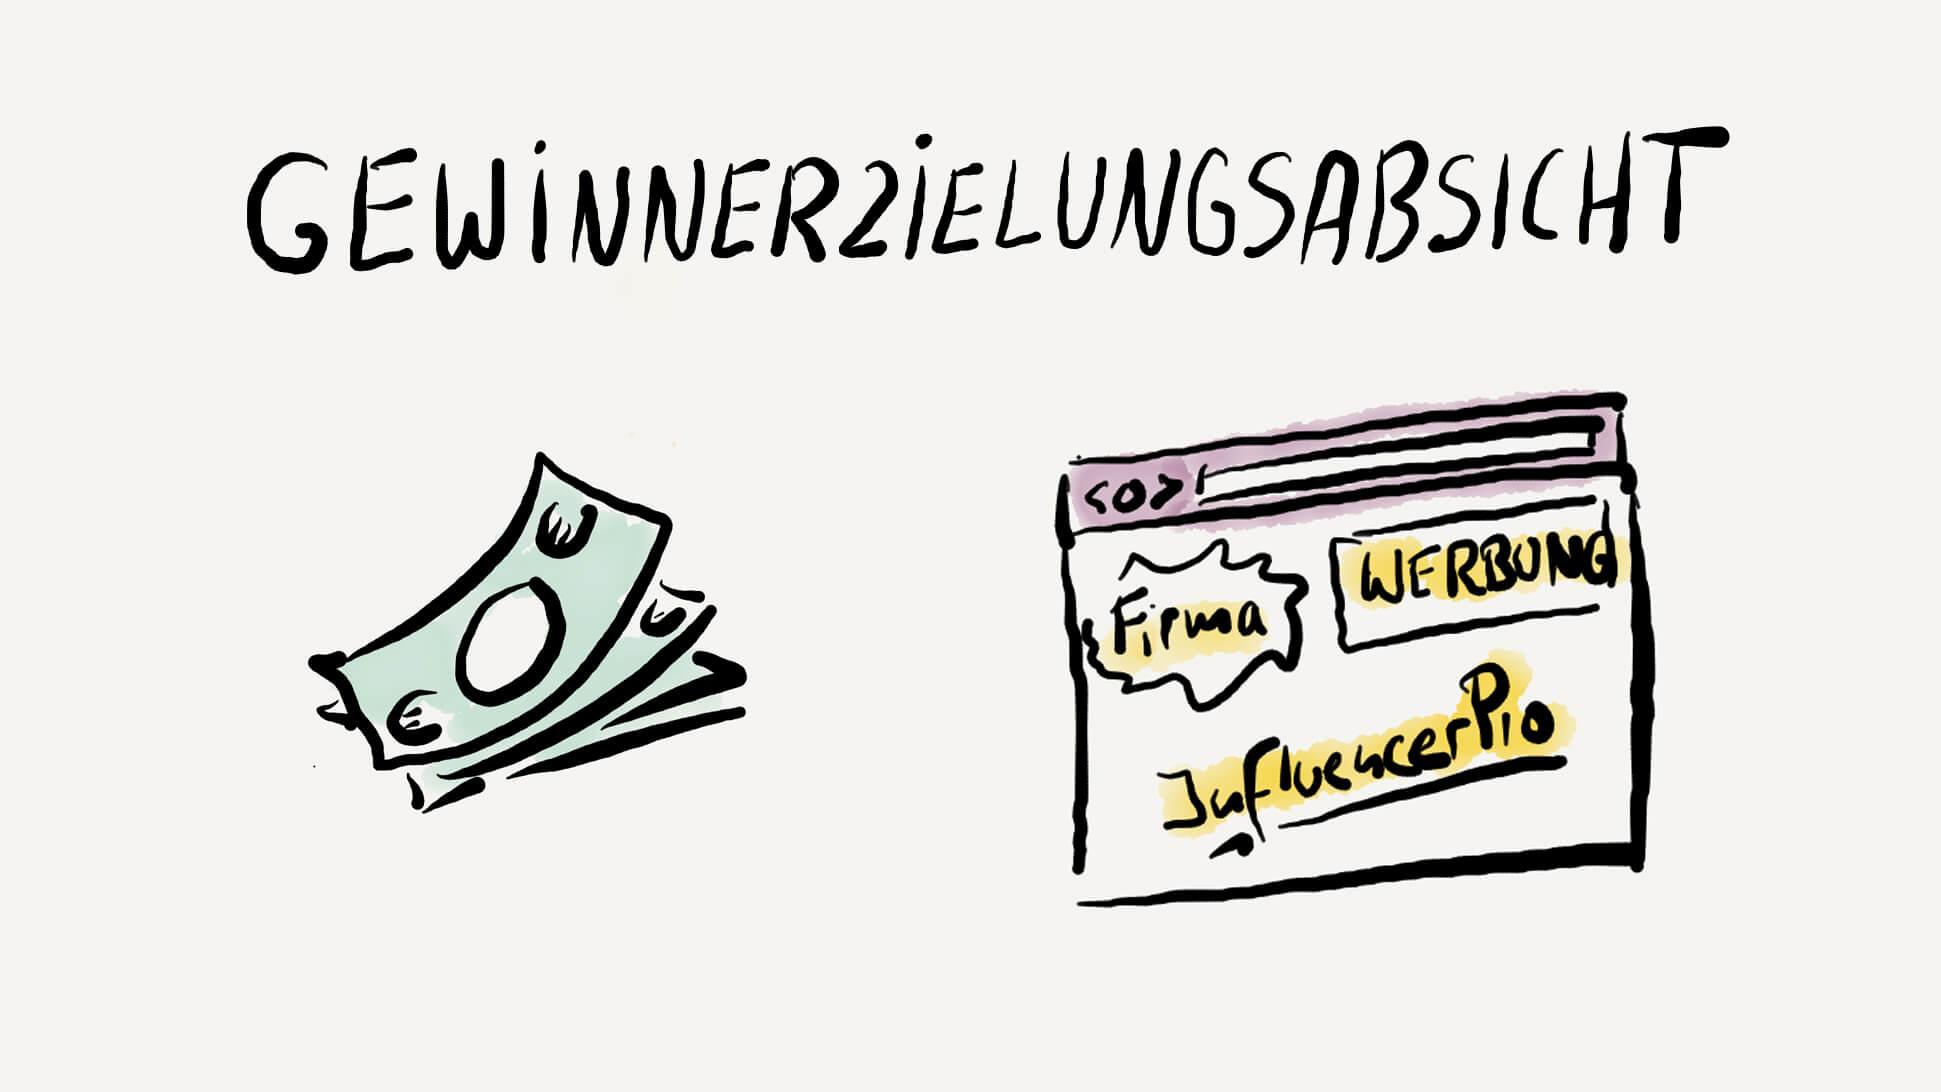 links framing embedding haftung dr schwenke embedding haftung ...